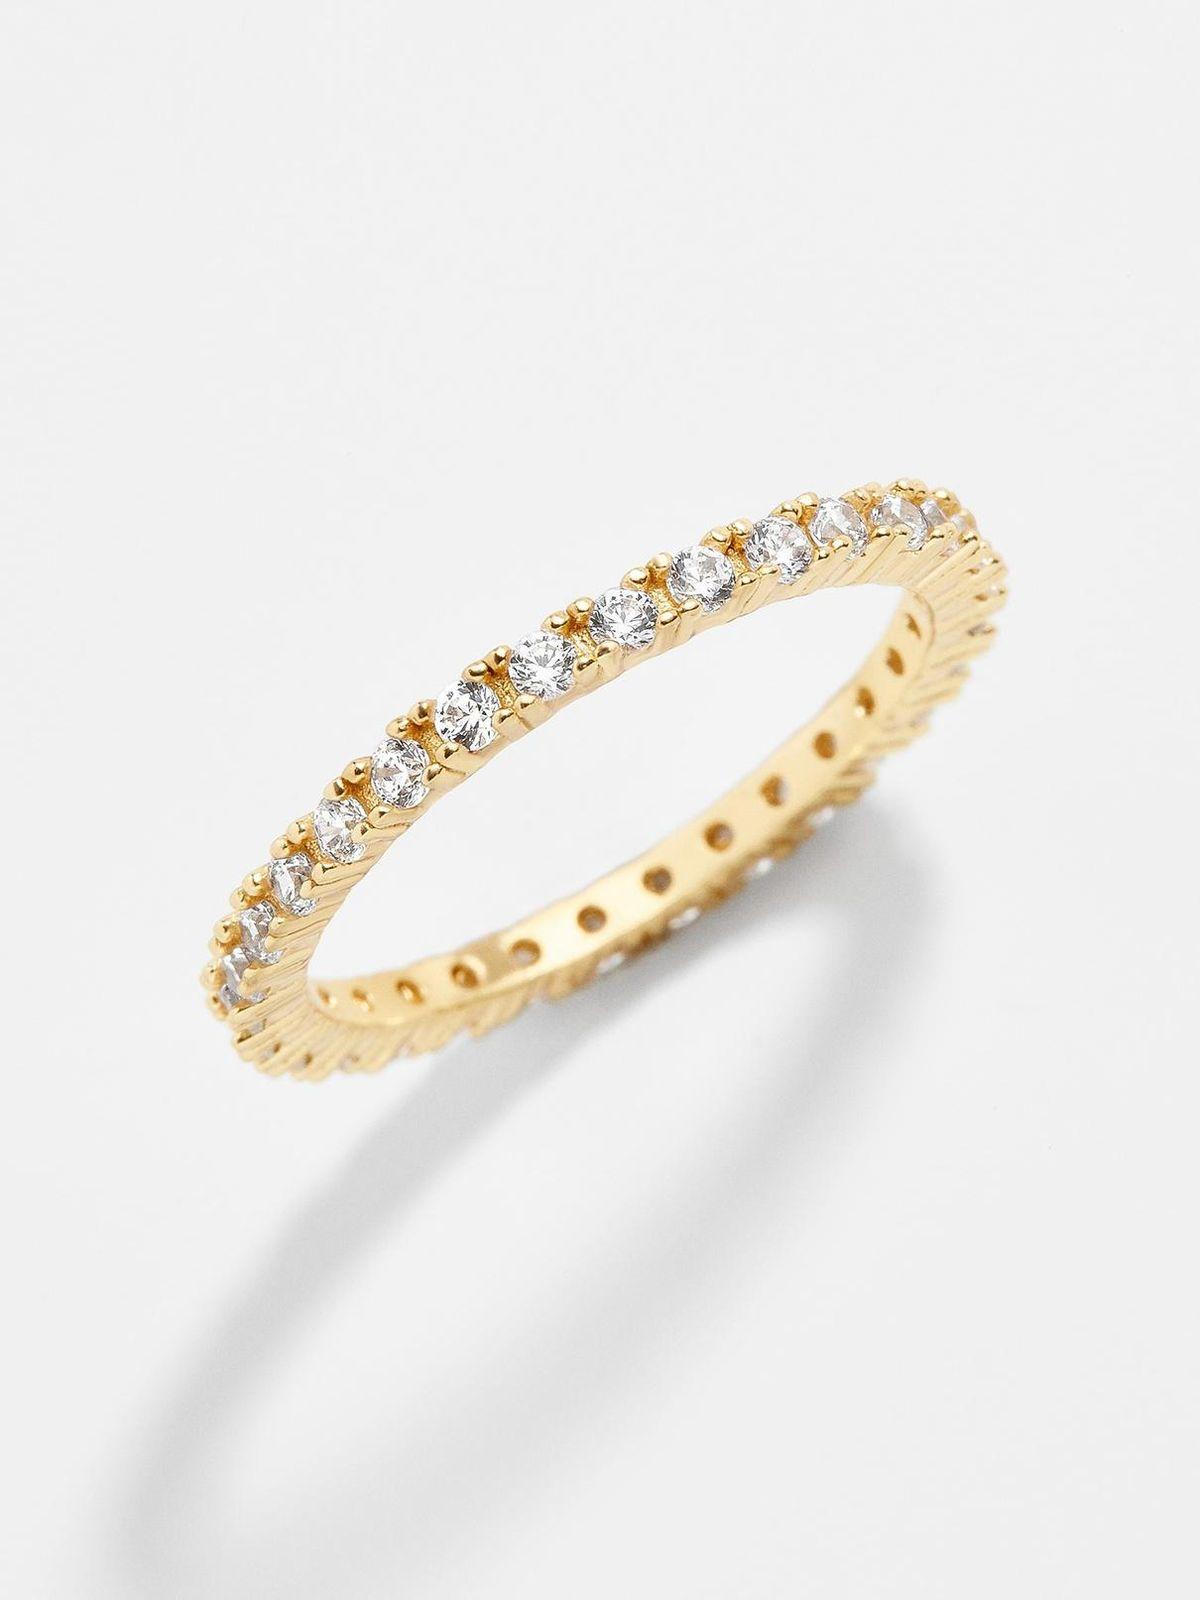 baublebar eleonora 18k gold ring